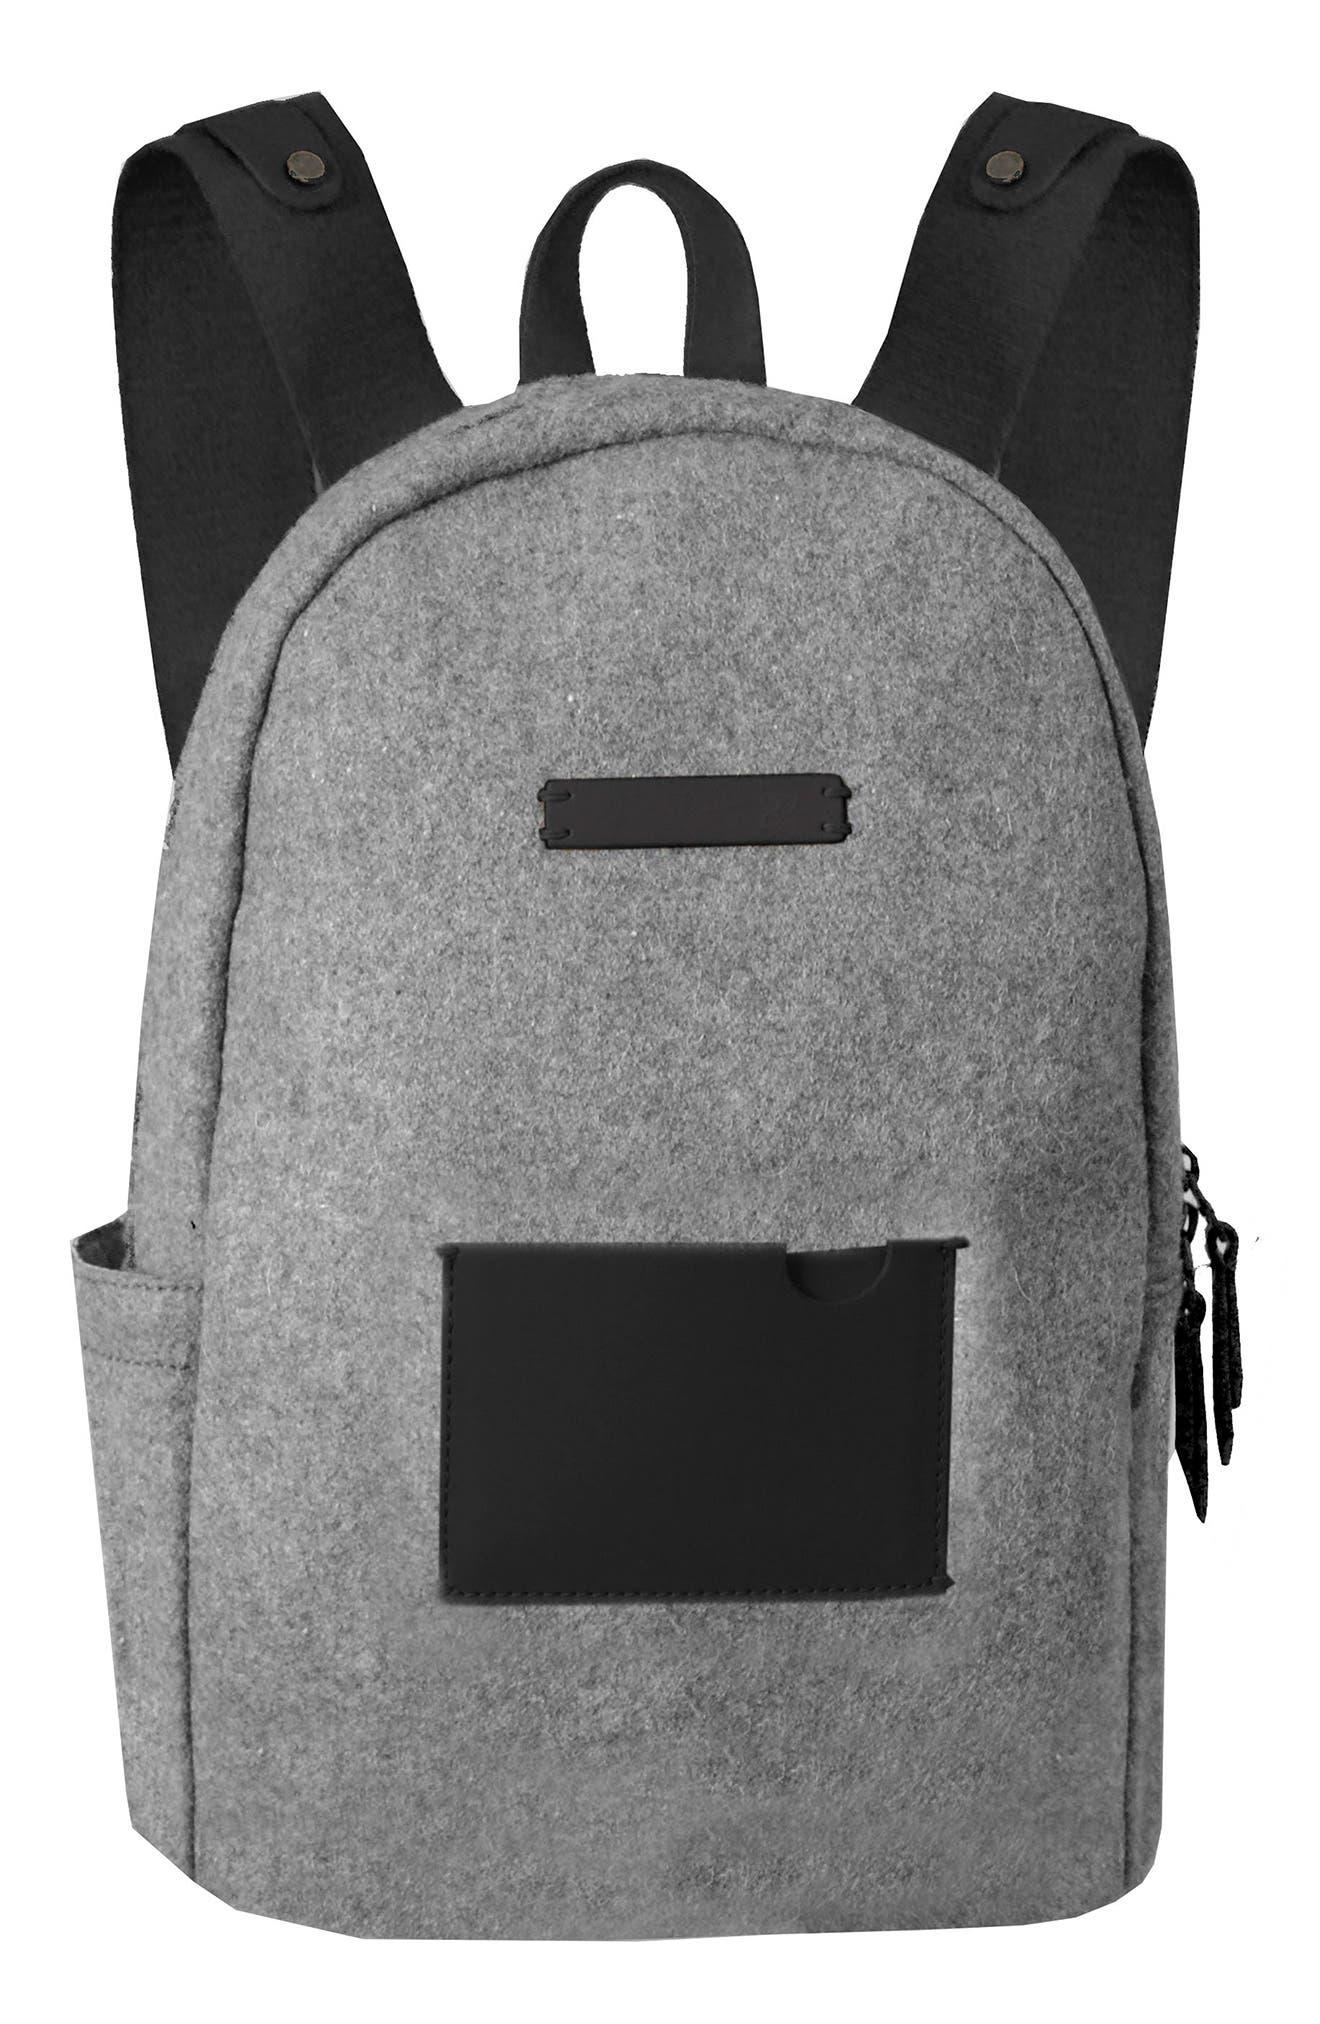 Indie Boiled Wool Backpack,                             Main thumbnail 1, color,                             Slate